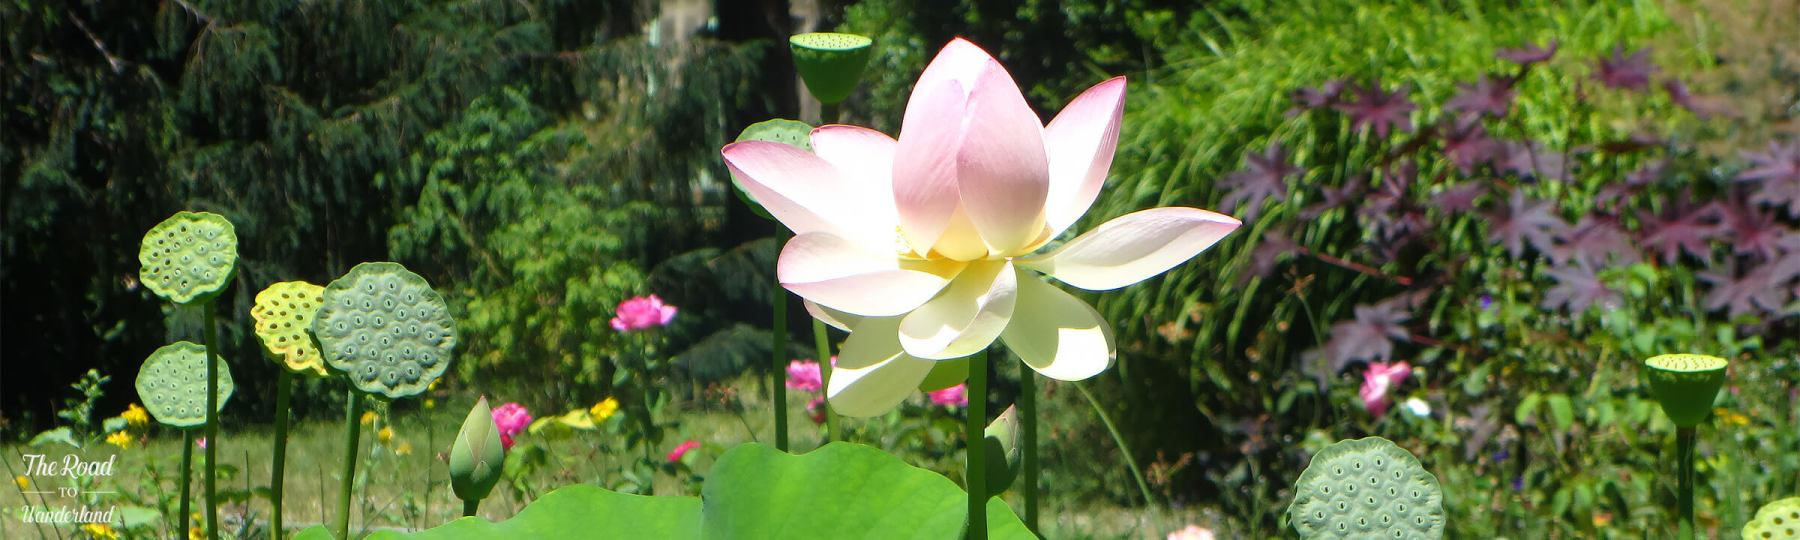 Lotus flower & seed pods, header image